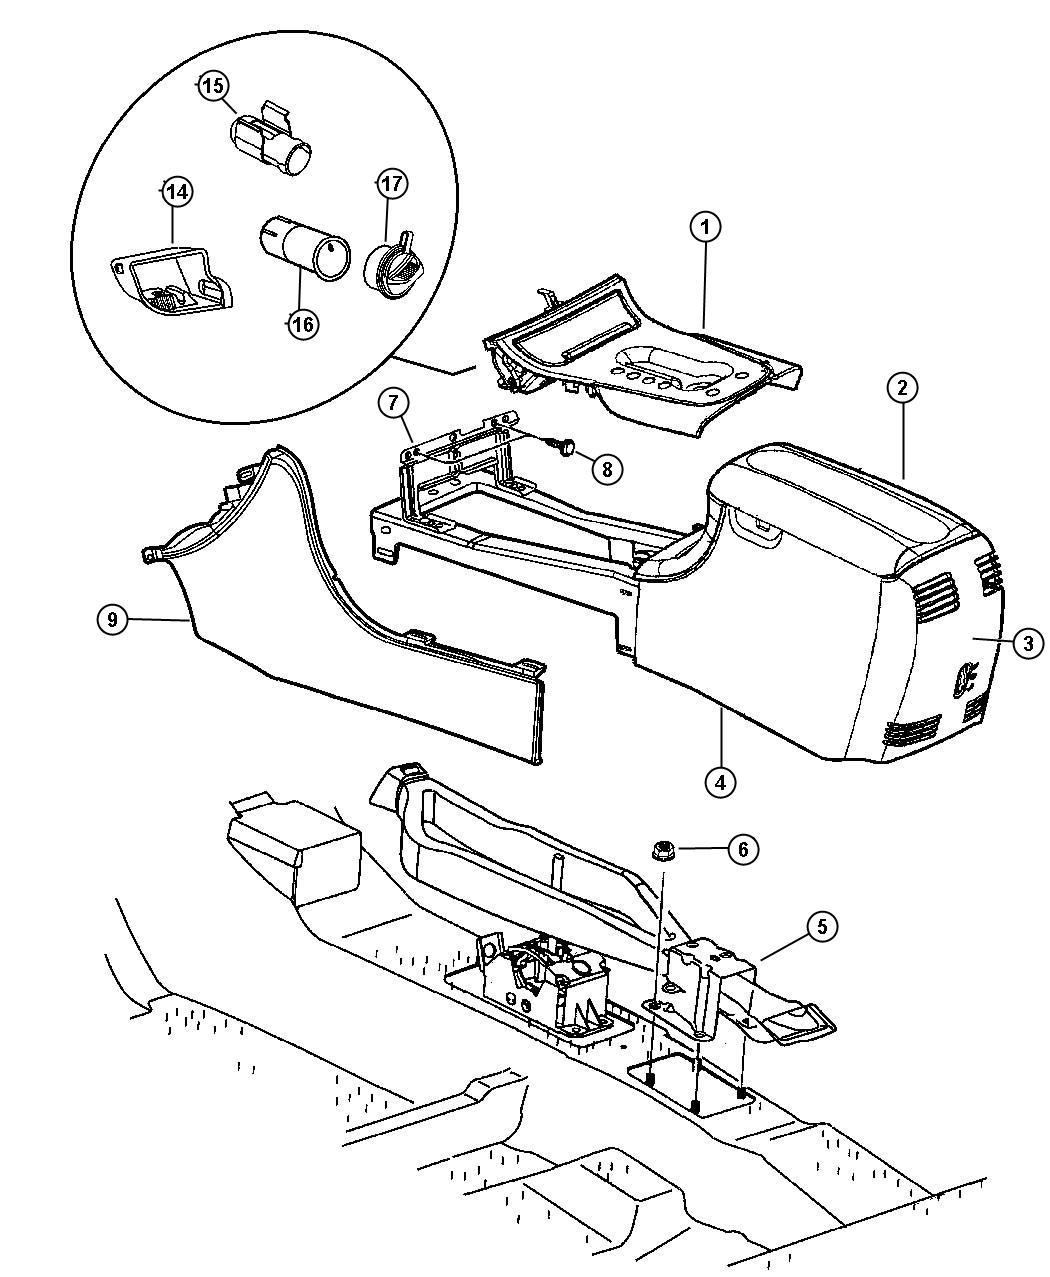 1999 Chrysler Concorde Latch. Armrest lid. [x5], [x9], [xb